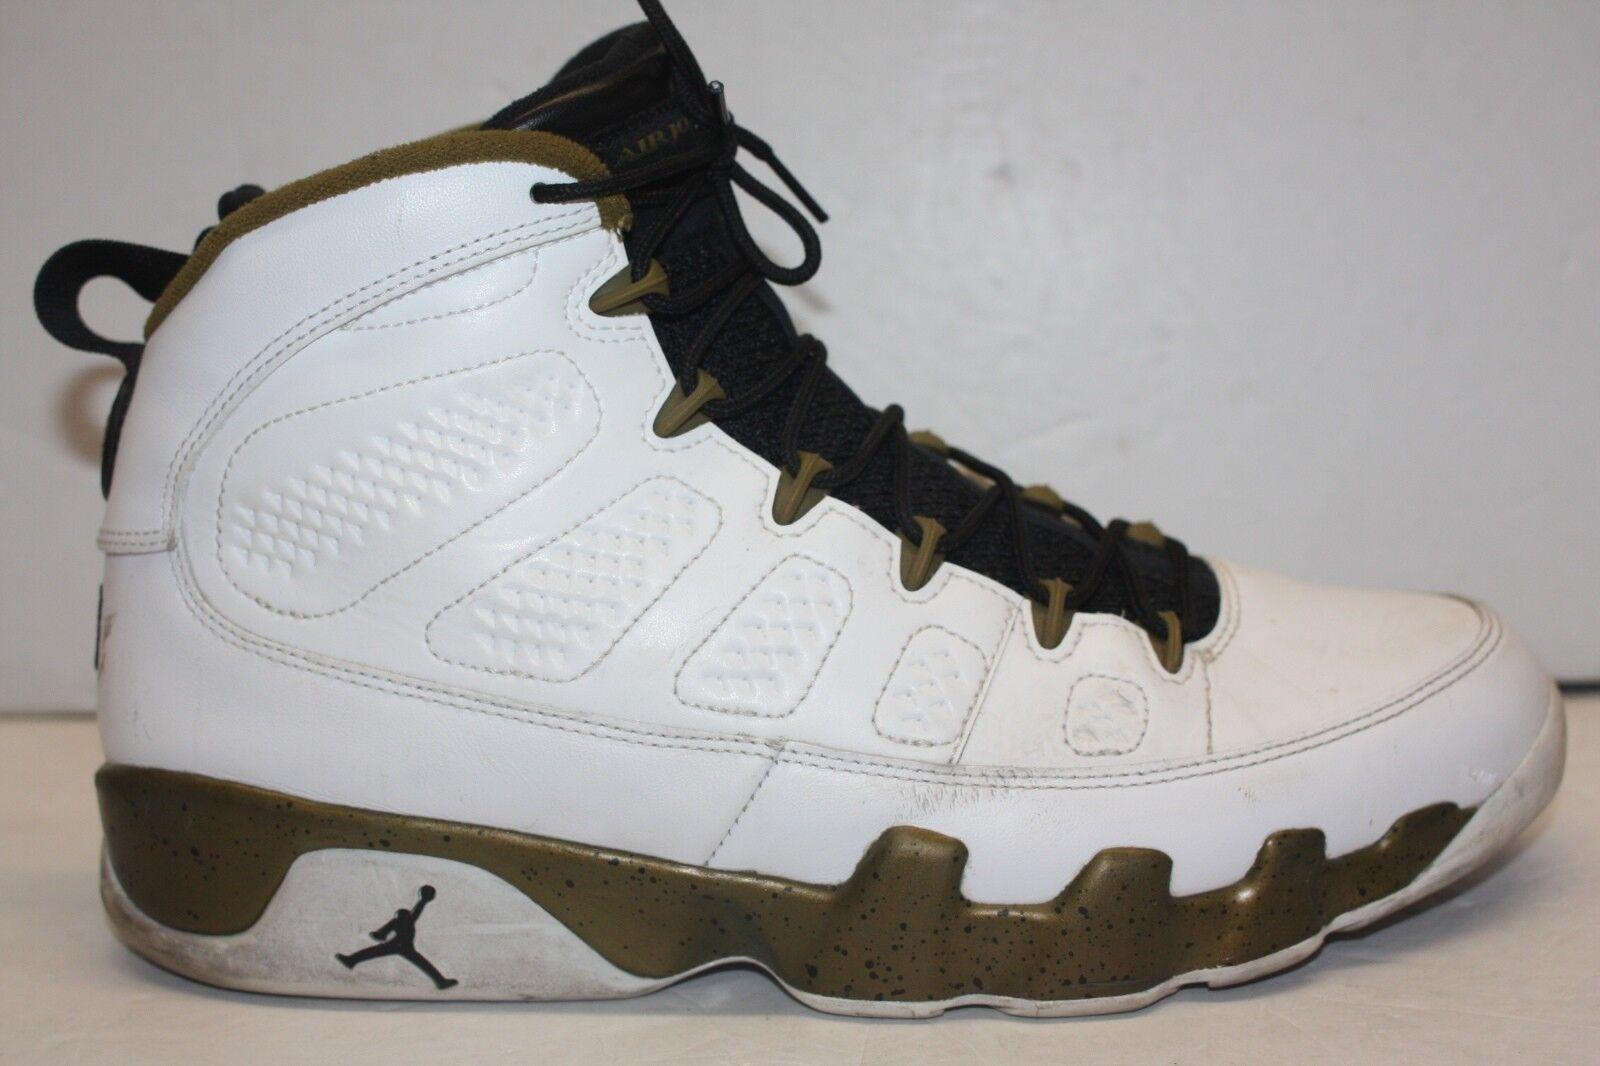 003e4a94074fe ... Nike Air Jordan Retro IX 9 MILITIA MILITIA MILITIA GREEN Statue Spirit  Copper 302370-109 ...